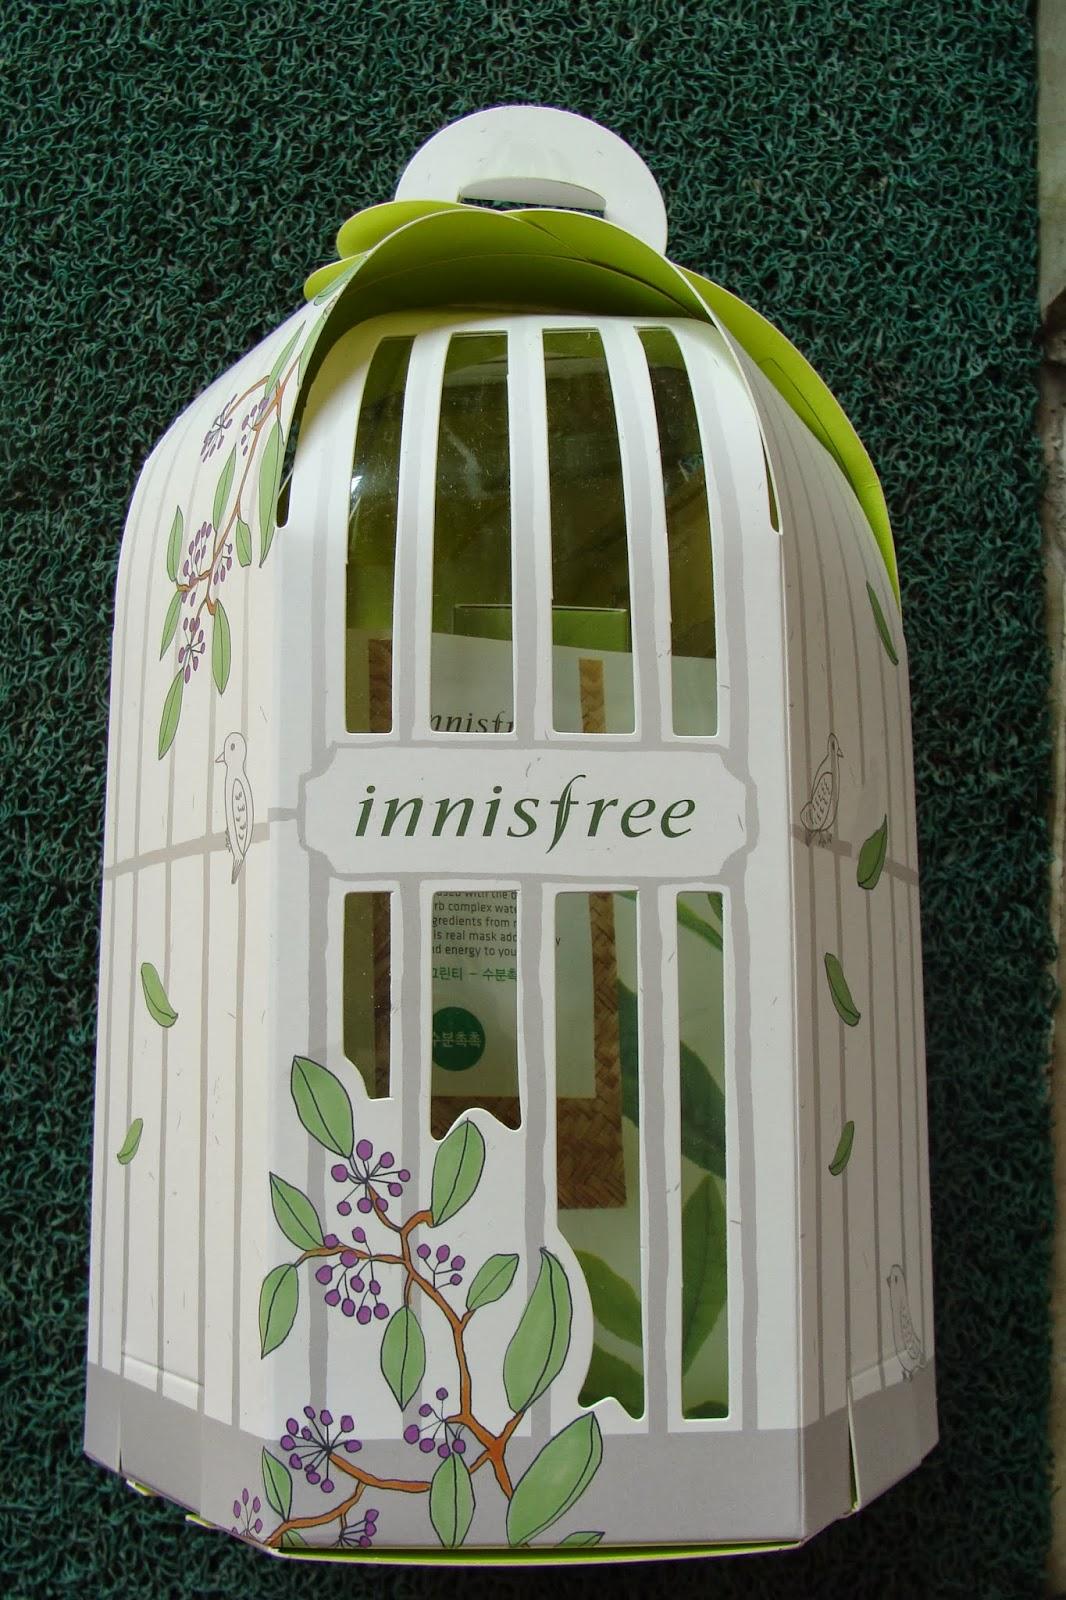 My Cute Innisfree Cage